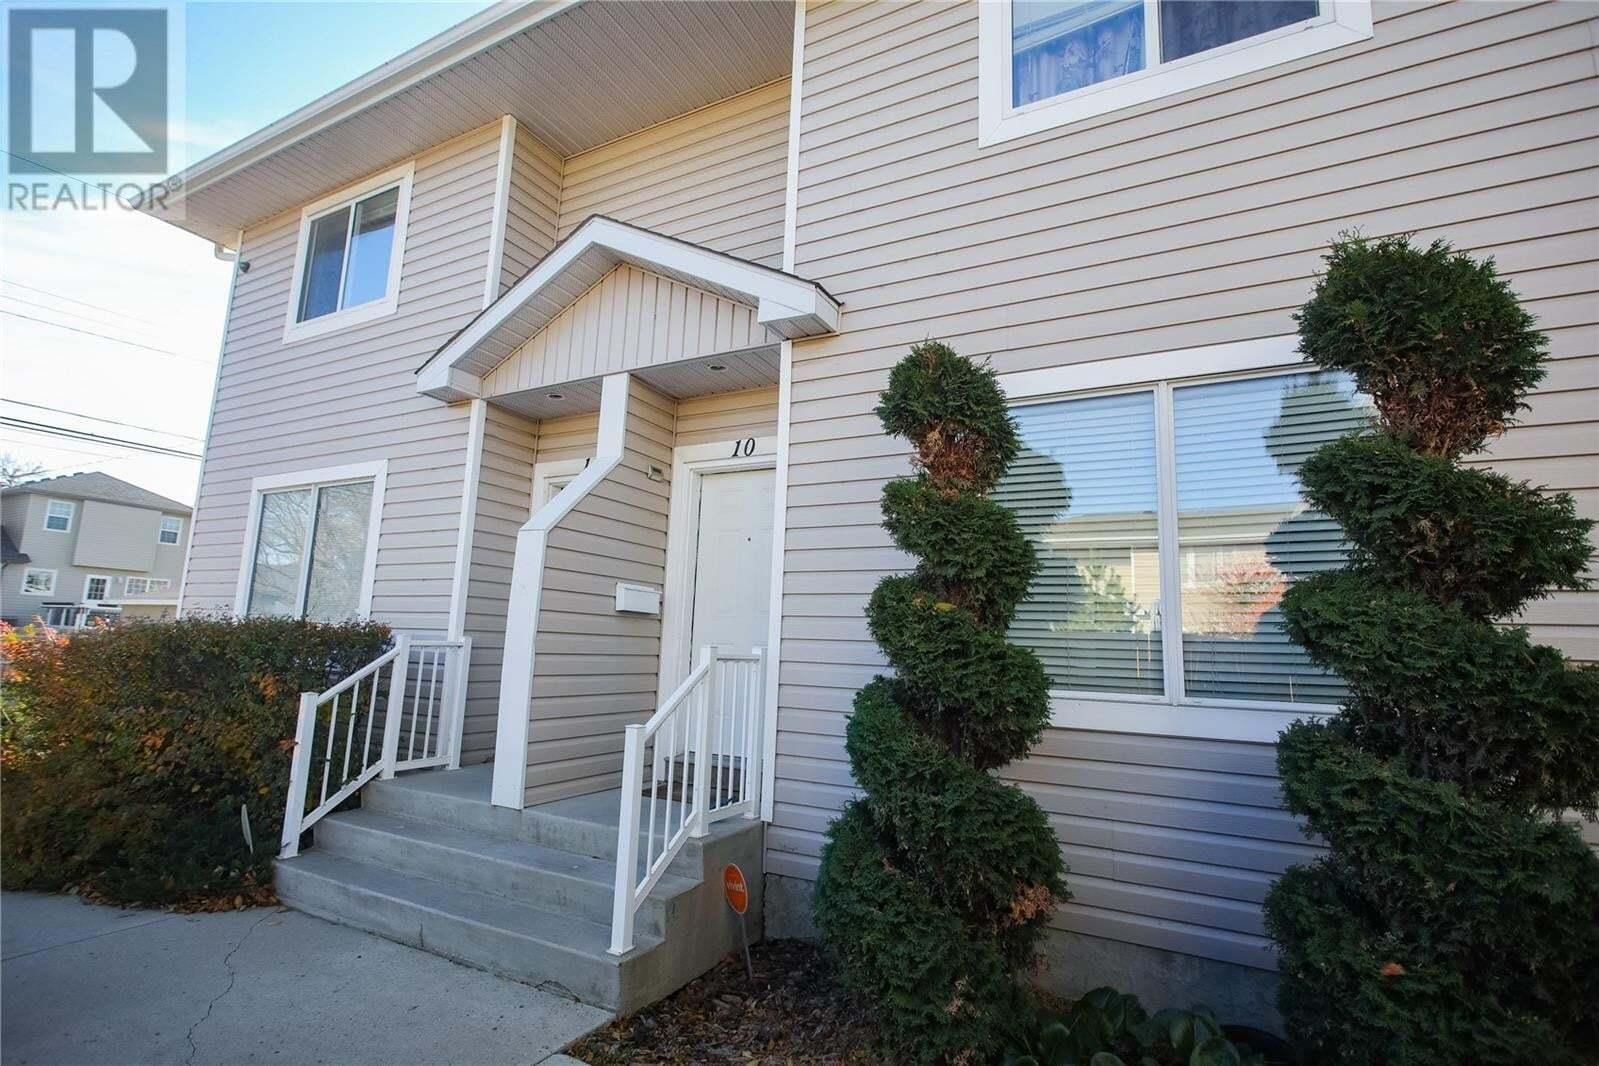 Townhouse for sale at 802 K Ave N Unit 10 Saskatoon Saskatchewan - MLS: SK830380